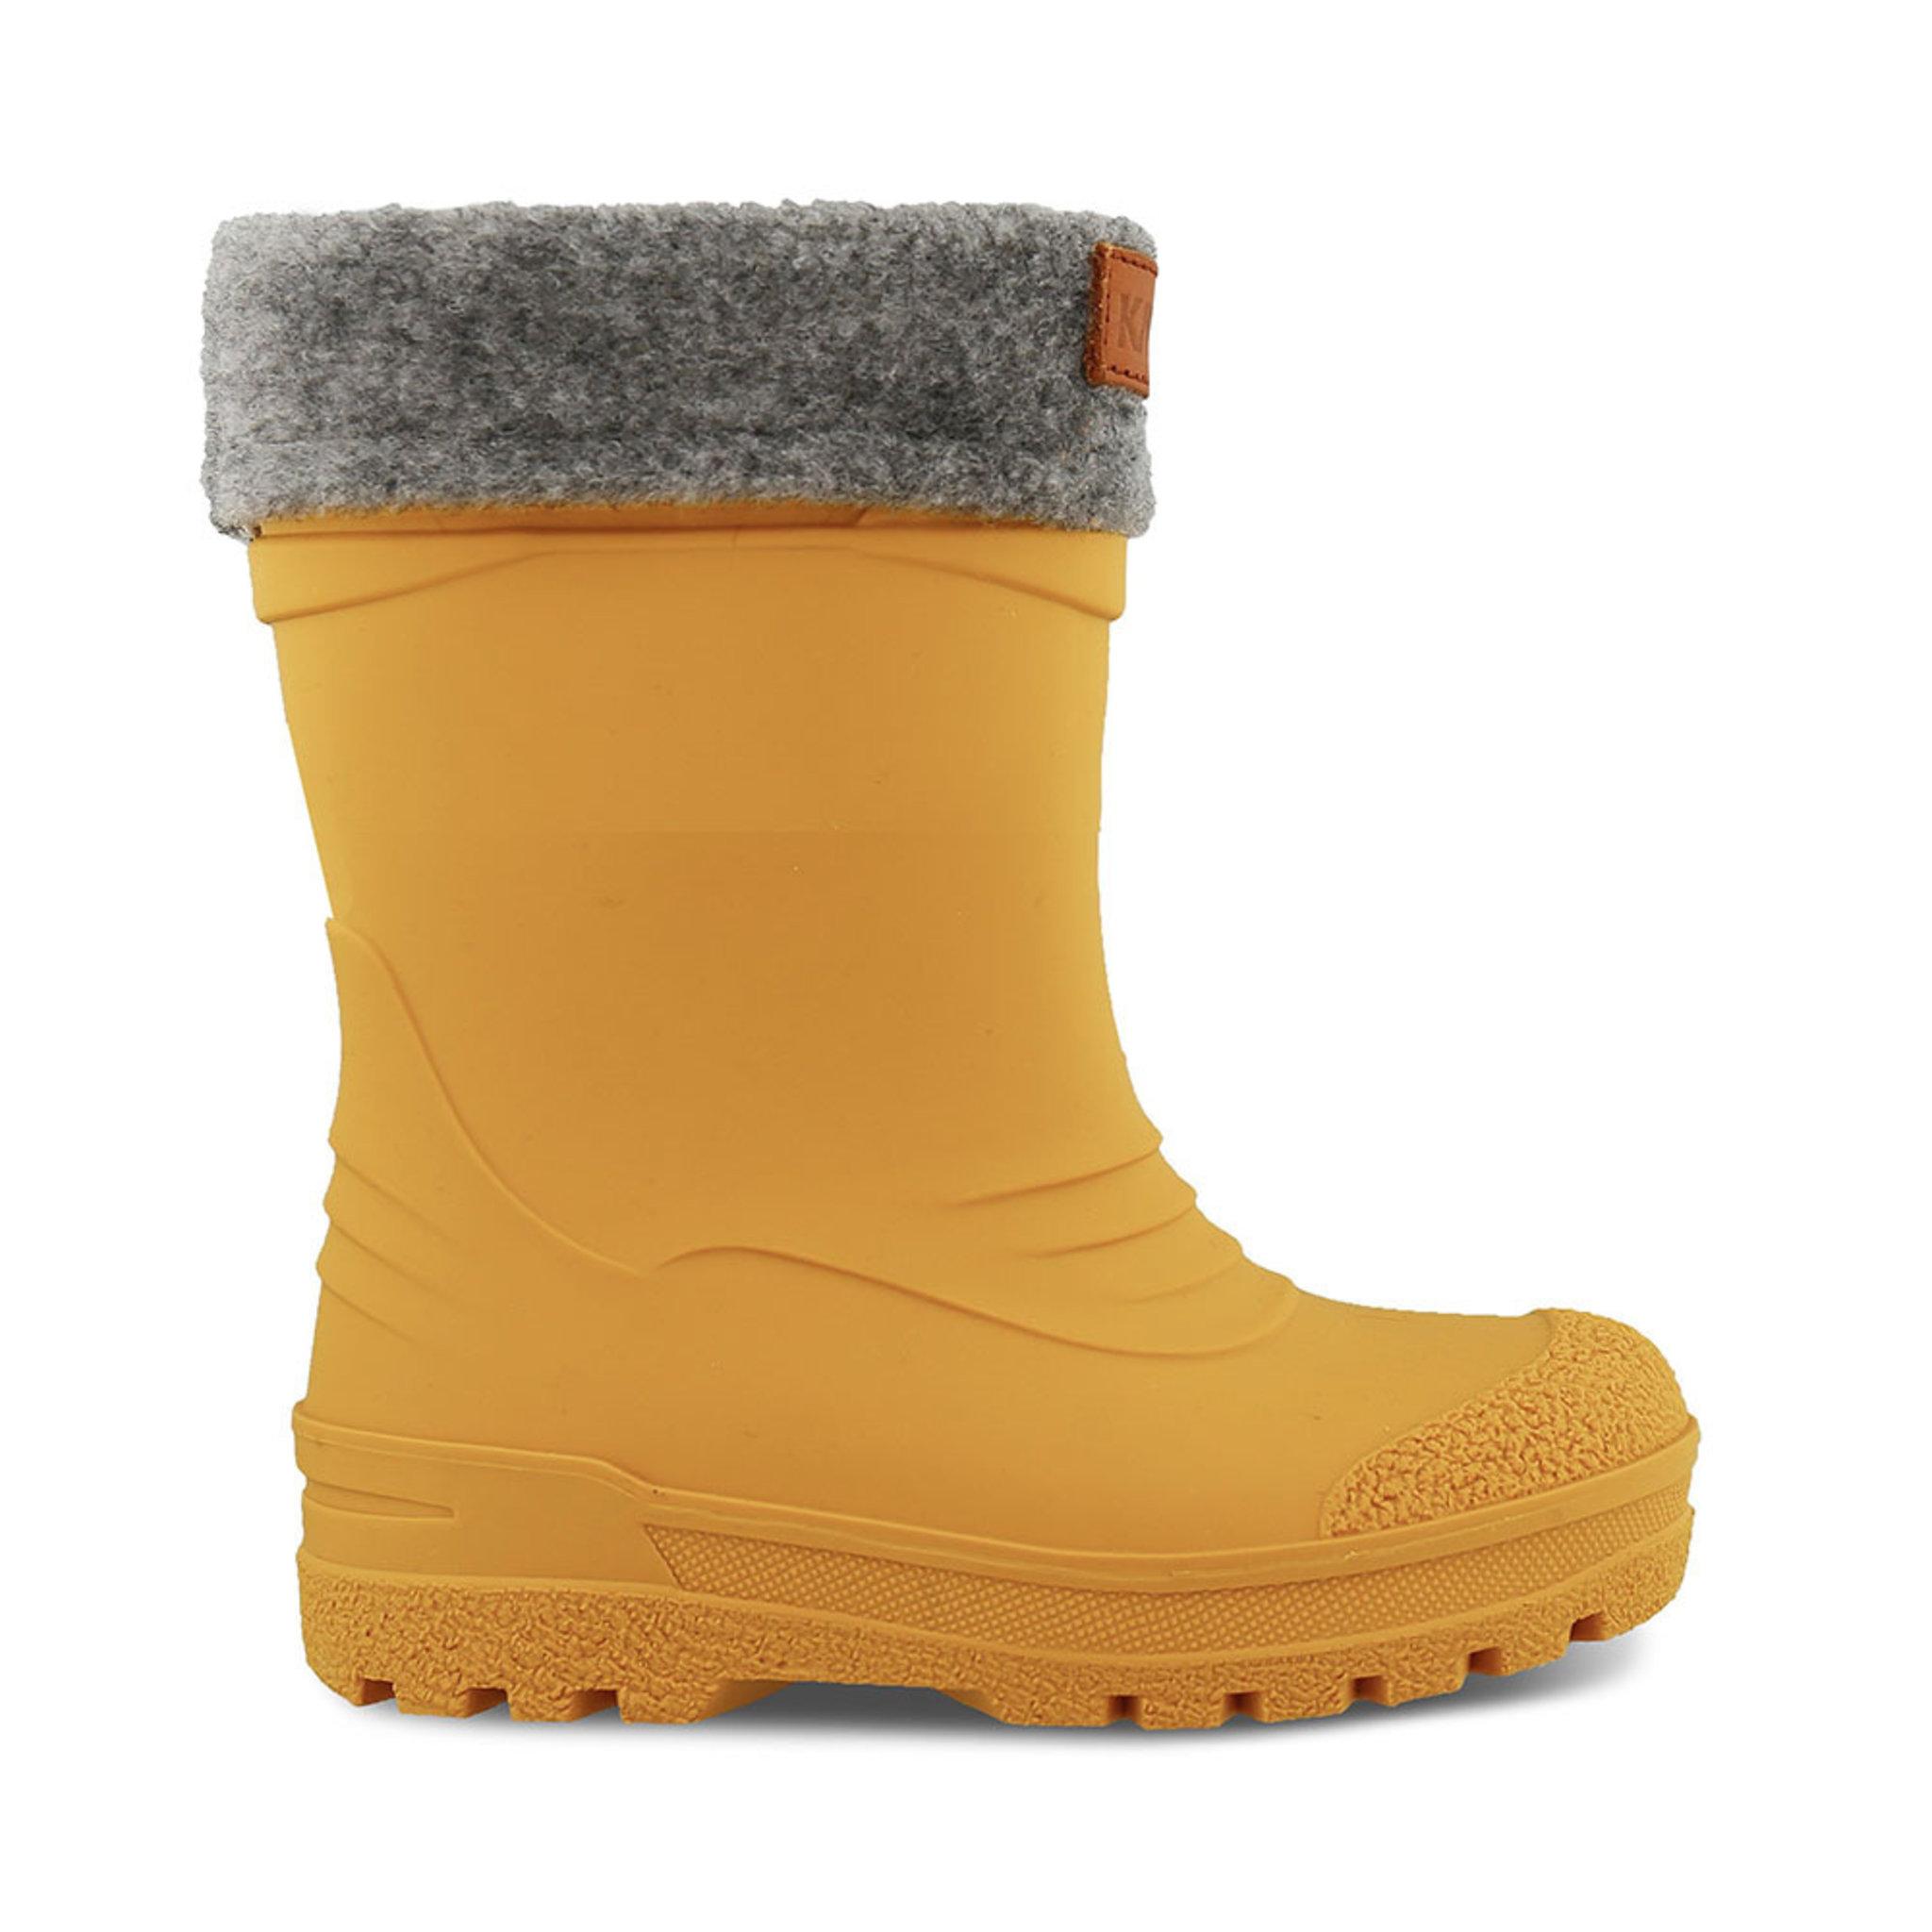 7e804fa99de Känga Gimo WP - Accessoarer & skor - Köp online på åhlens.se!